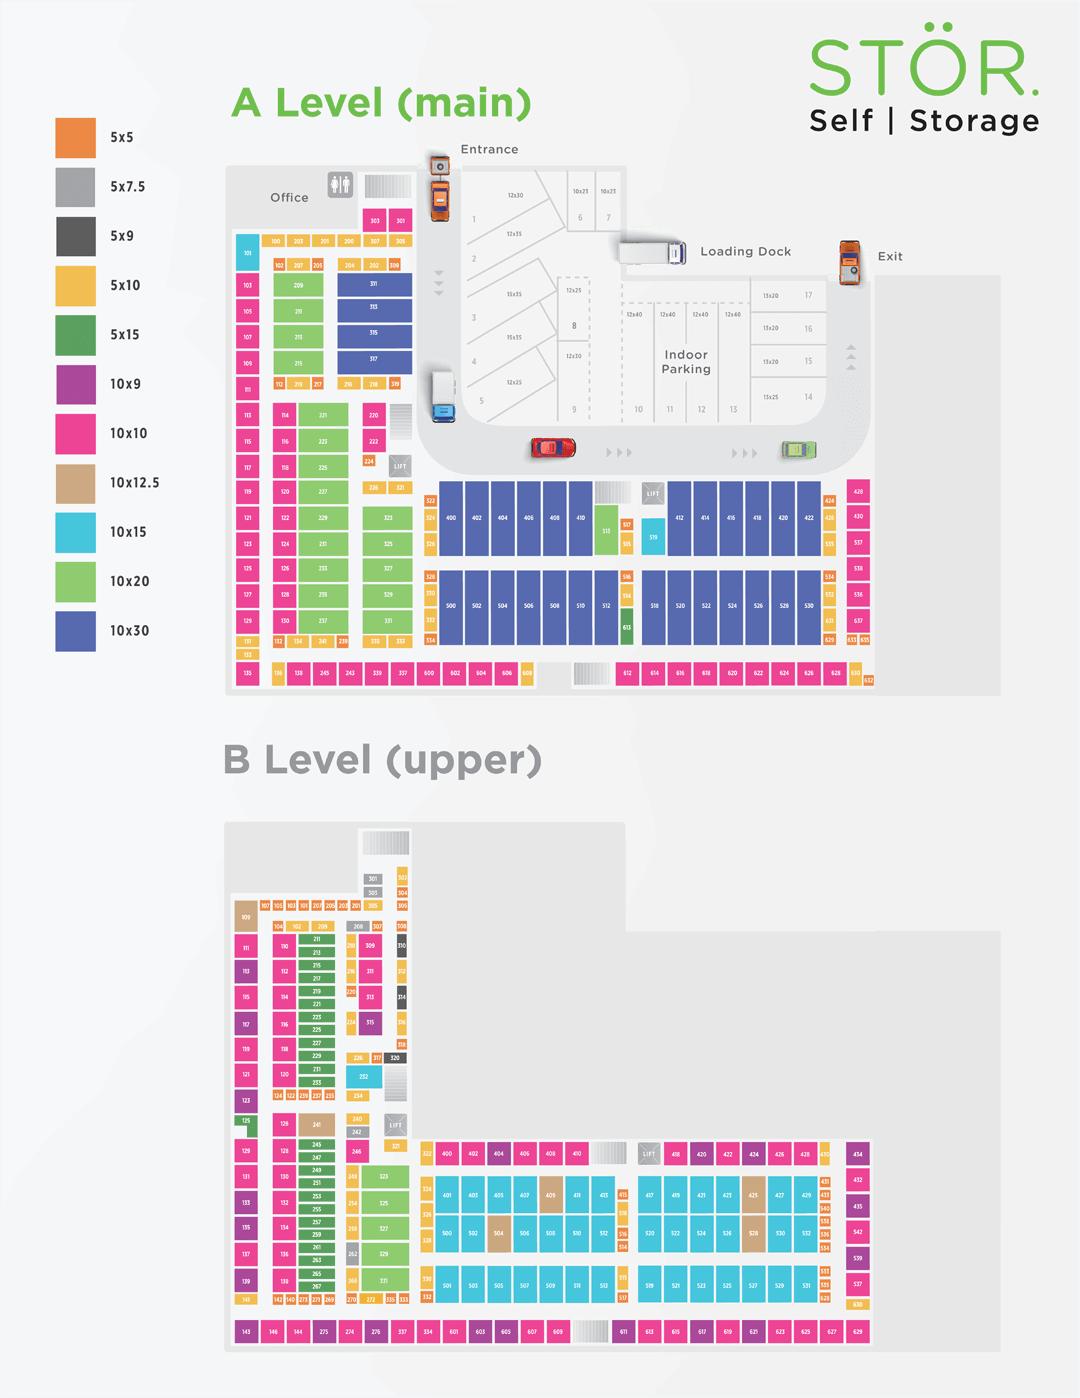 Storage types map Brighton